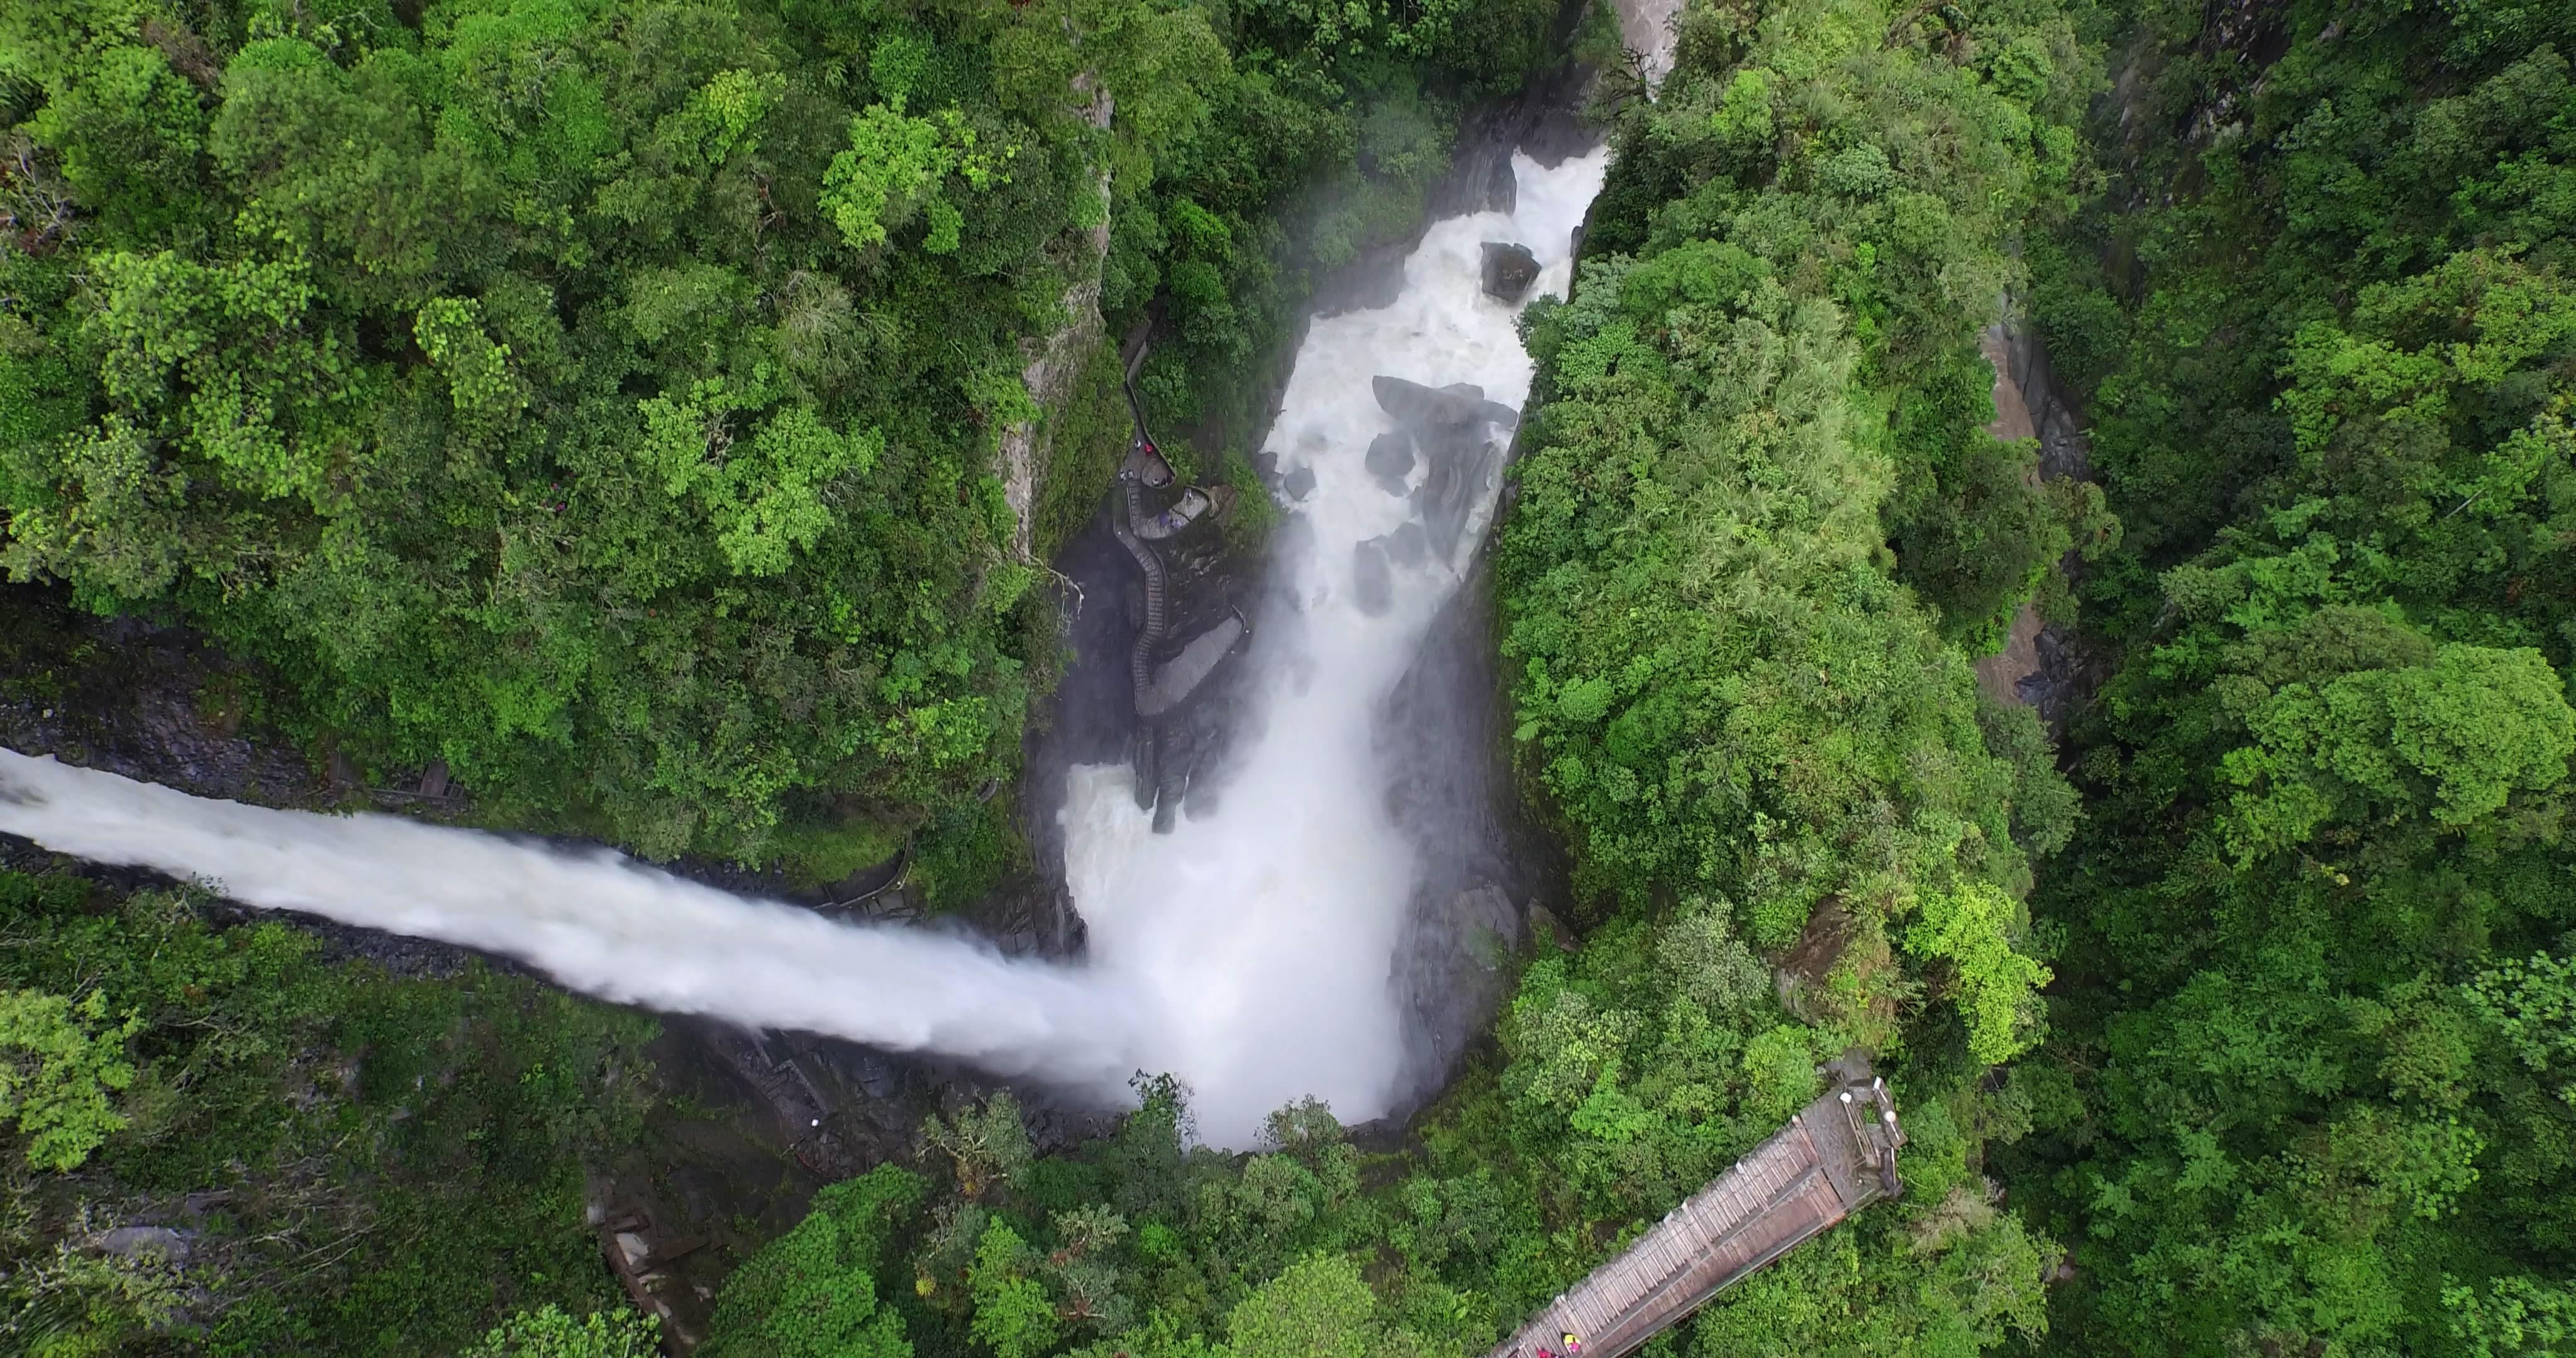 Pailon del Diablo's Waterfall, Baños, Tungurahua, Ecuador